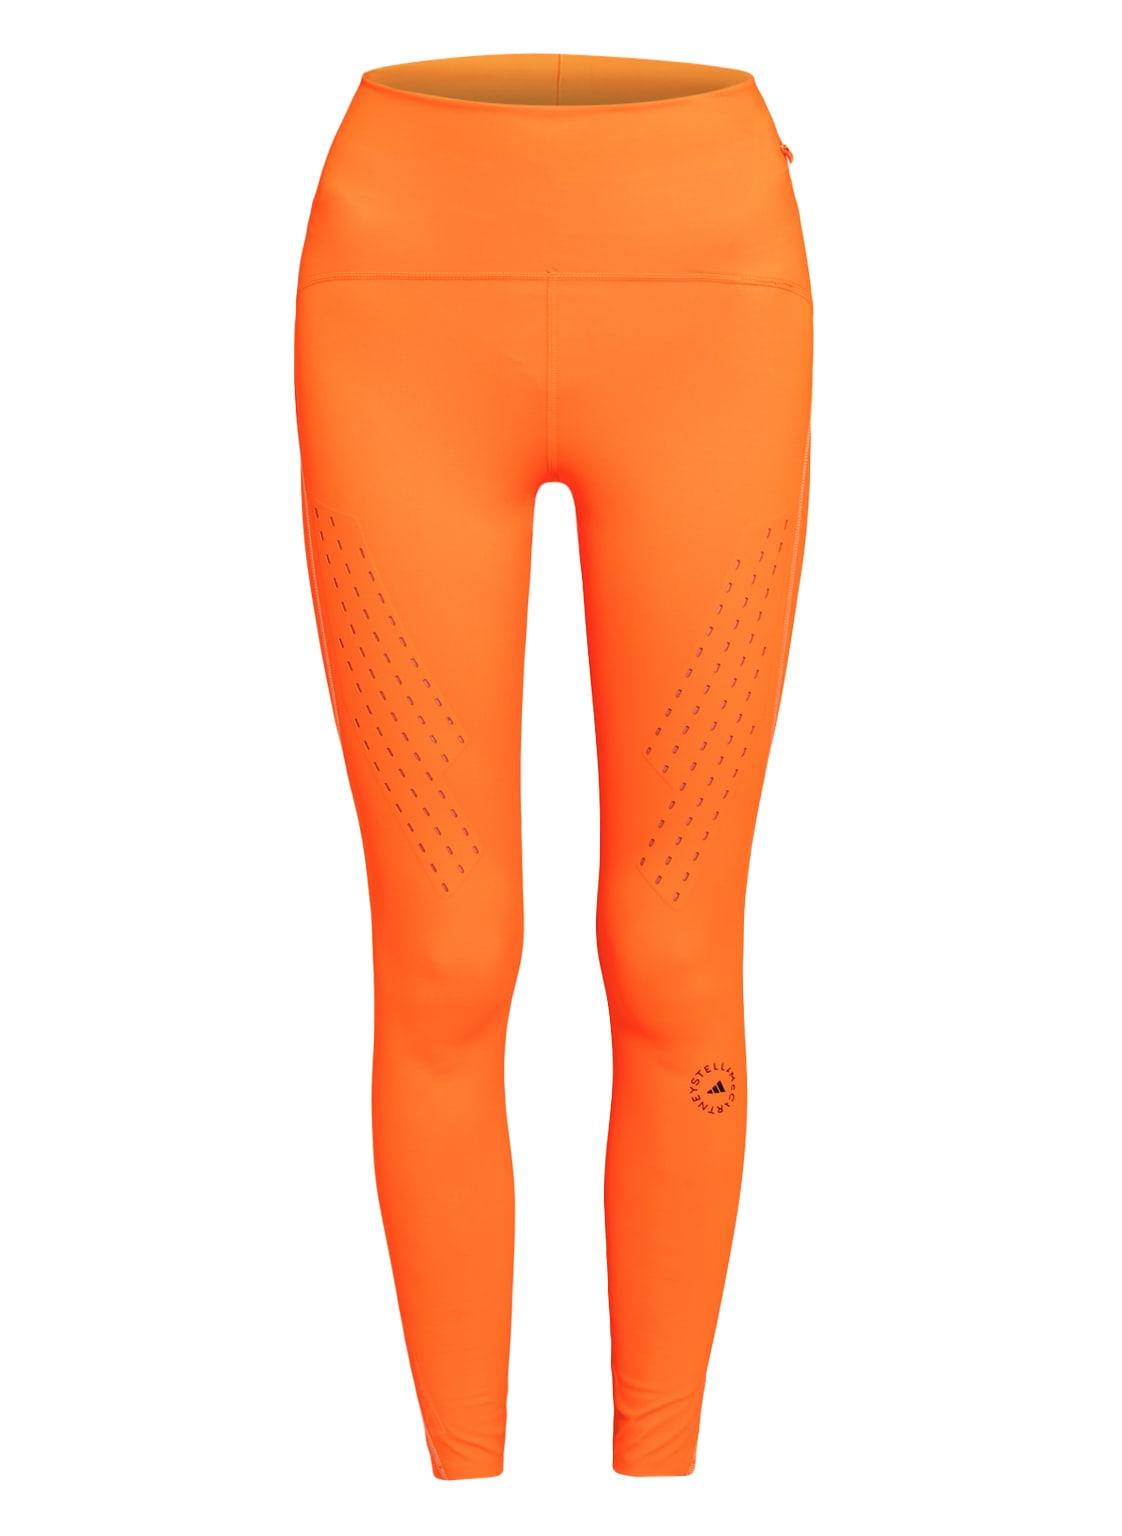 Image of Adidas By Stella Mccartney Tights Truepurpose orange